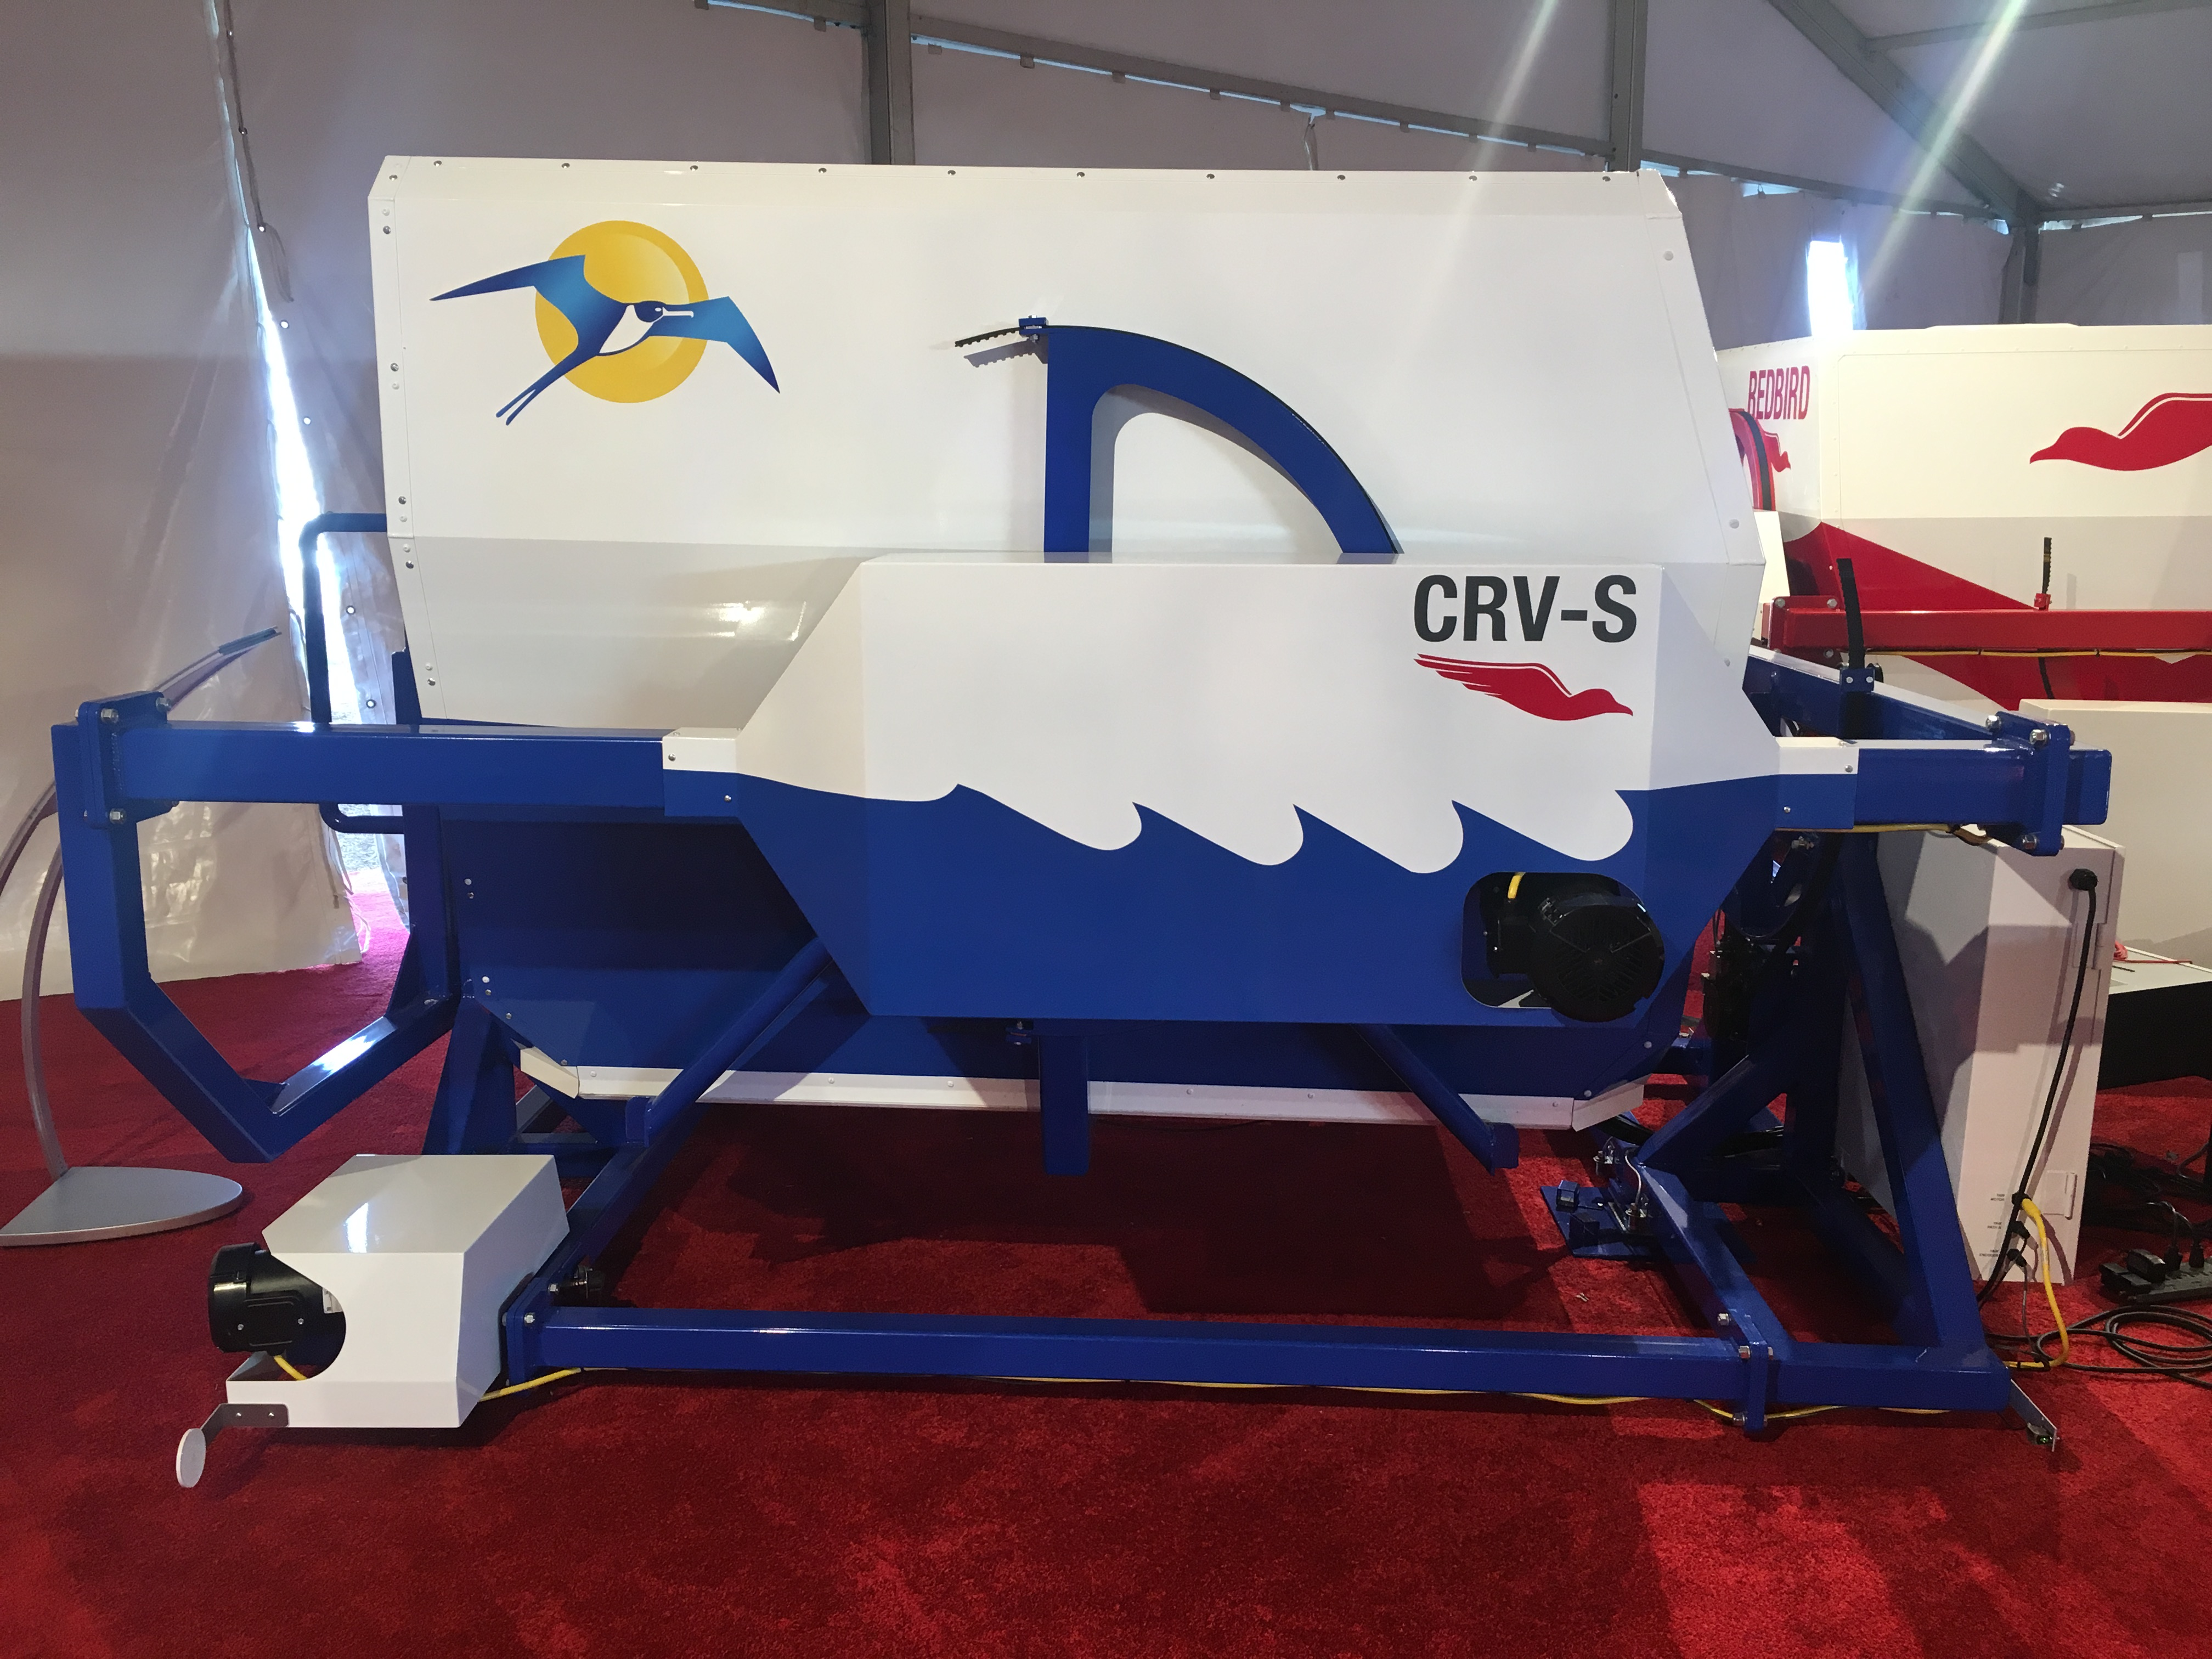 Redbird Flight, Wipaire, and Tropic Ocean Airways Partner to Transform Amphibious Aircraft Training